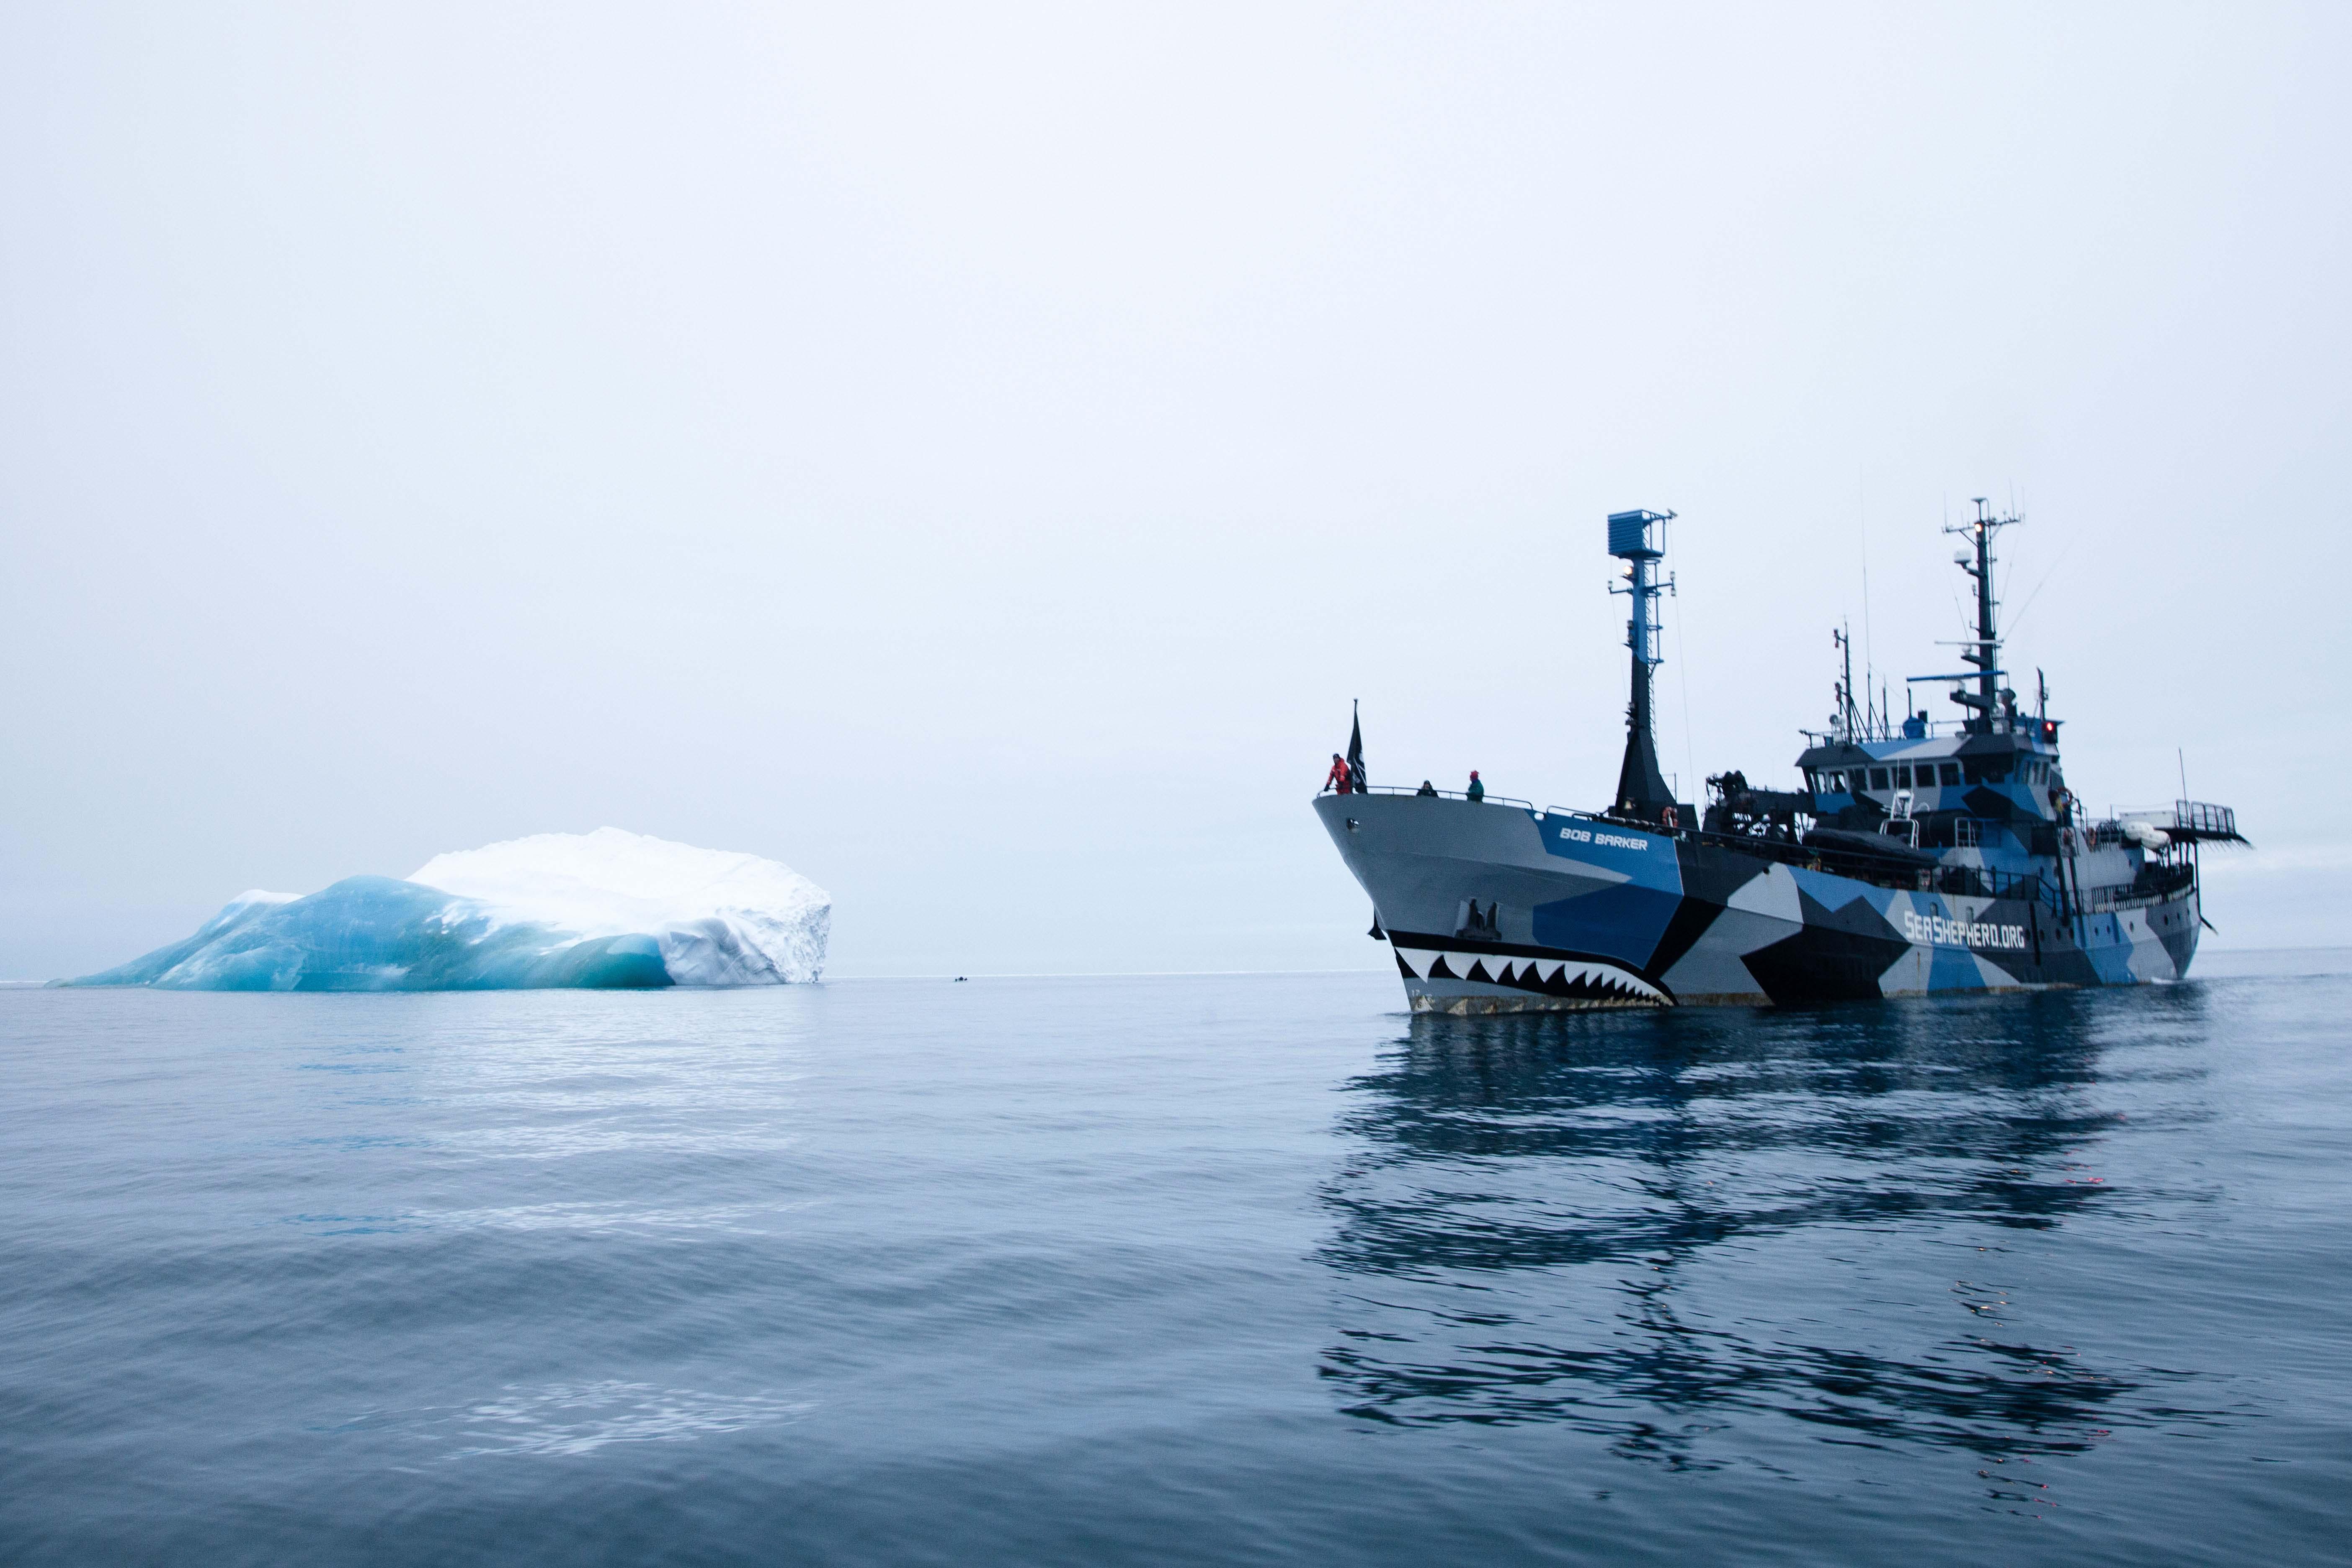 130115-TW-08-Bob-Barker-Iceberg-08